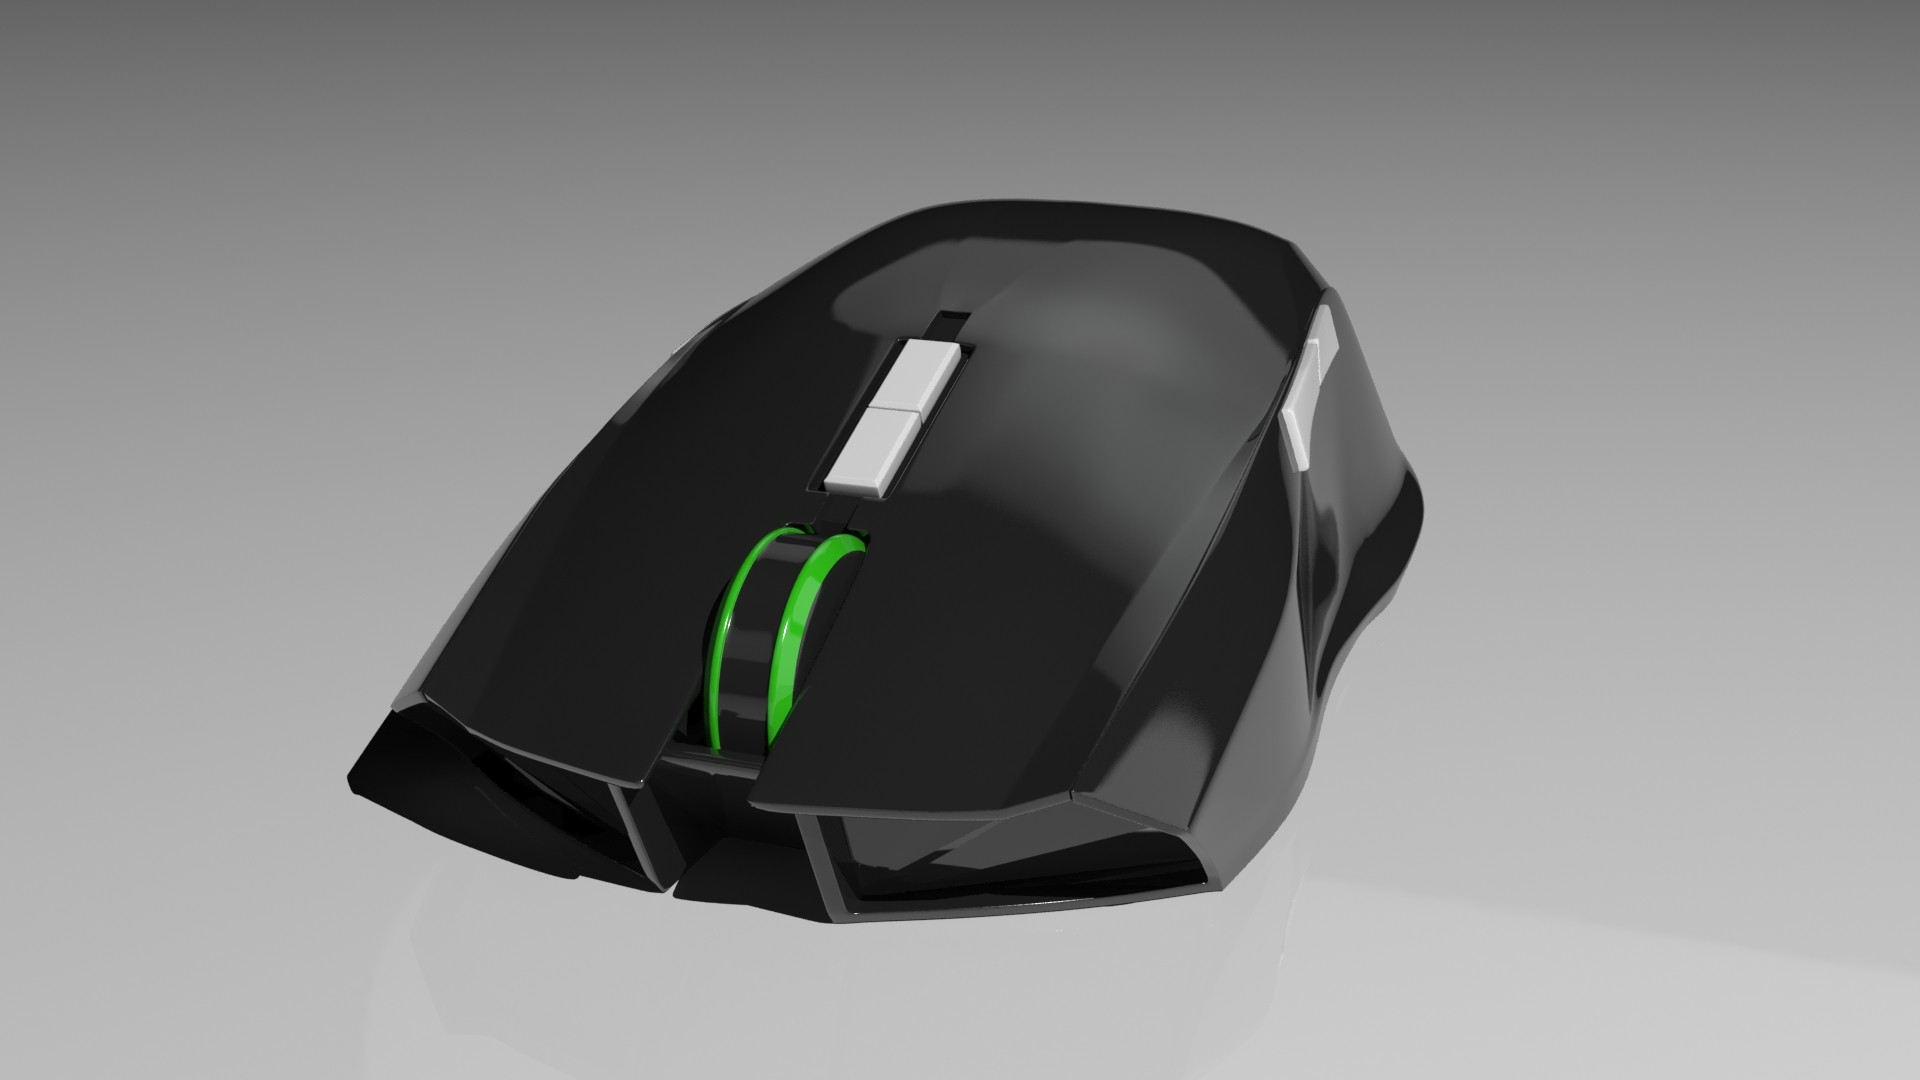 Marko Ui Gaming Mouse Razer Taipan White Buy It Here Https Cgtradercom 3d Models Electronics Computer Similiar Design As